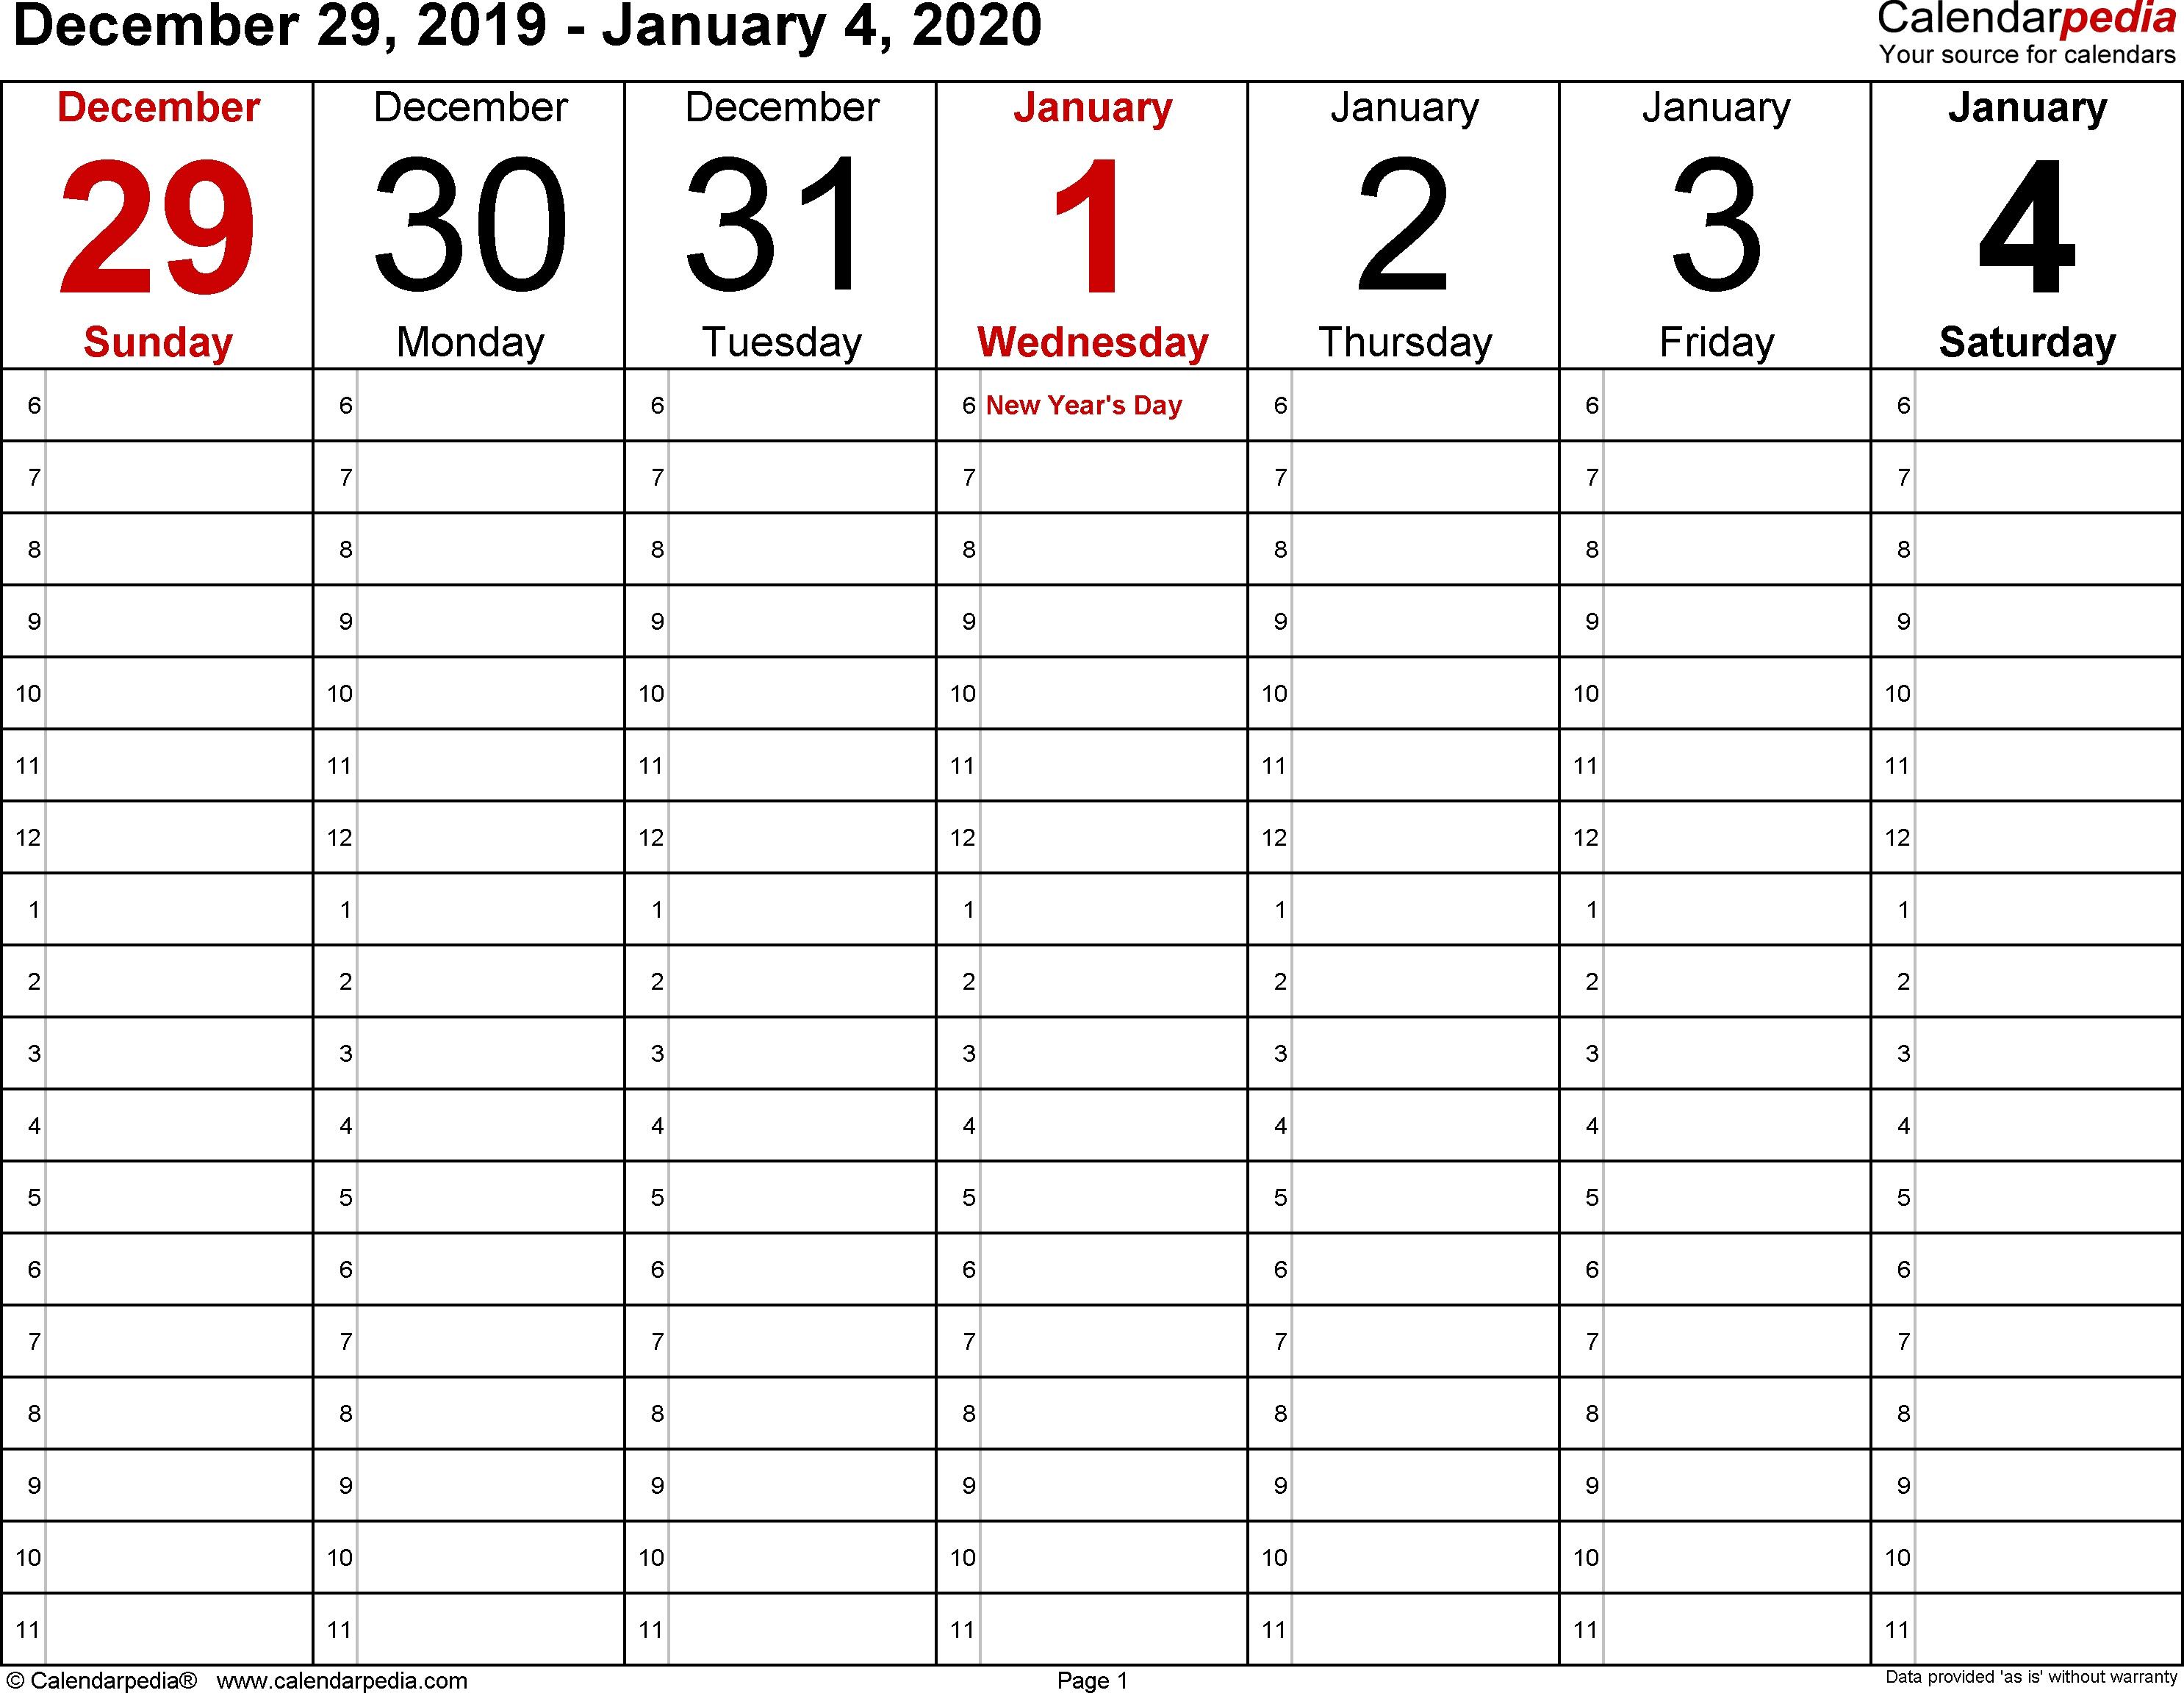 January 2020 Weekly Calendar | Blank January 2020 Calendar-January 2020 Yearly Calendar